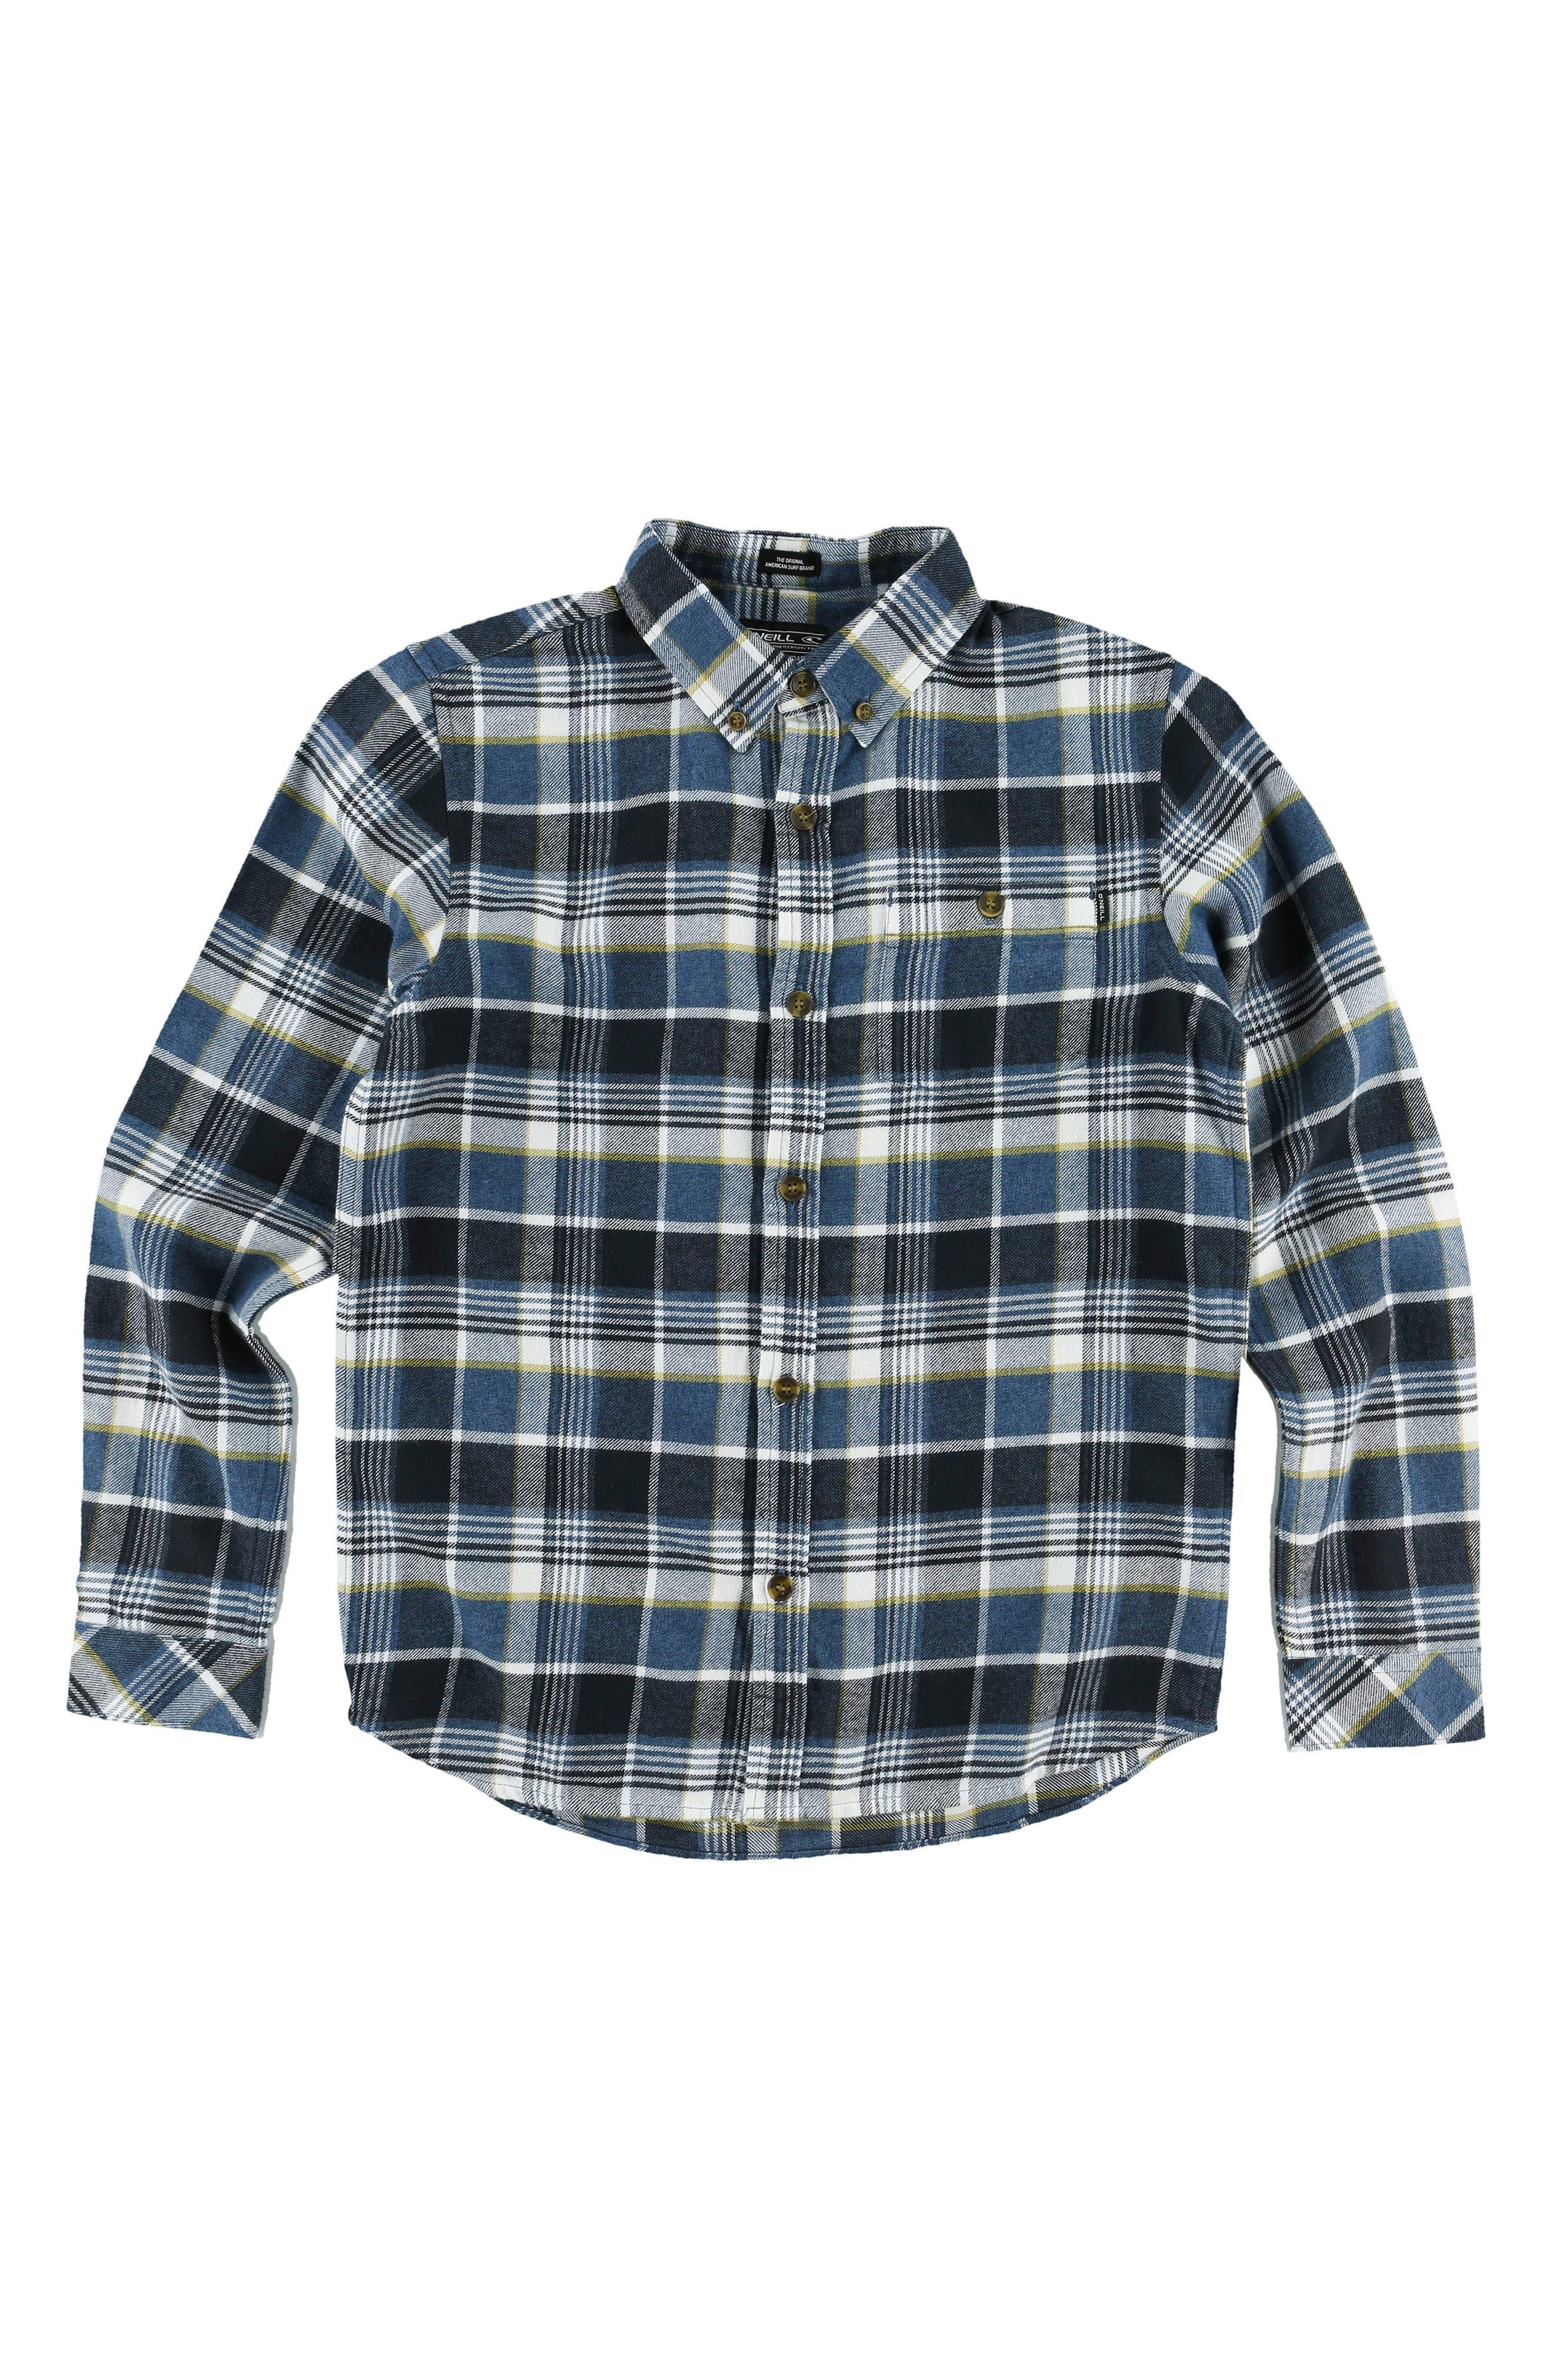 Alternate Image 1 Selected - O'Neill Redmond Flannel Shirt (Big Boys)